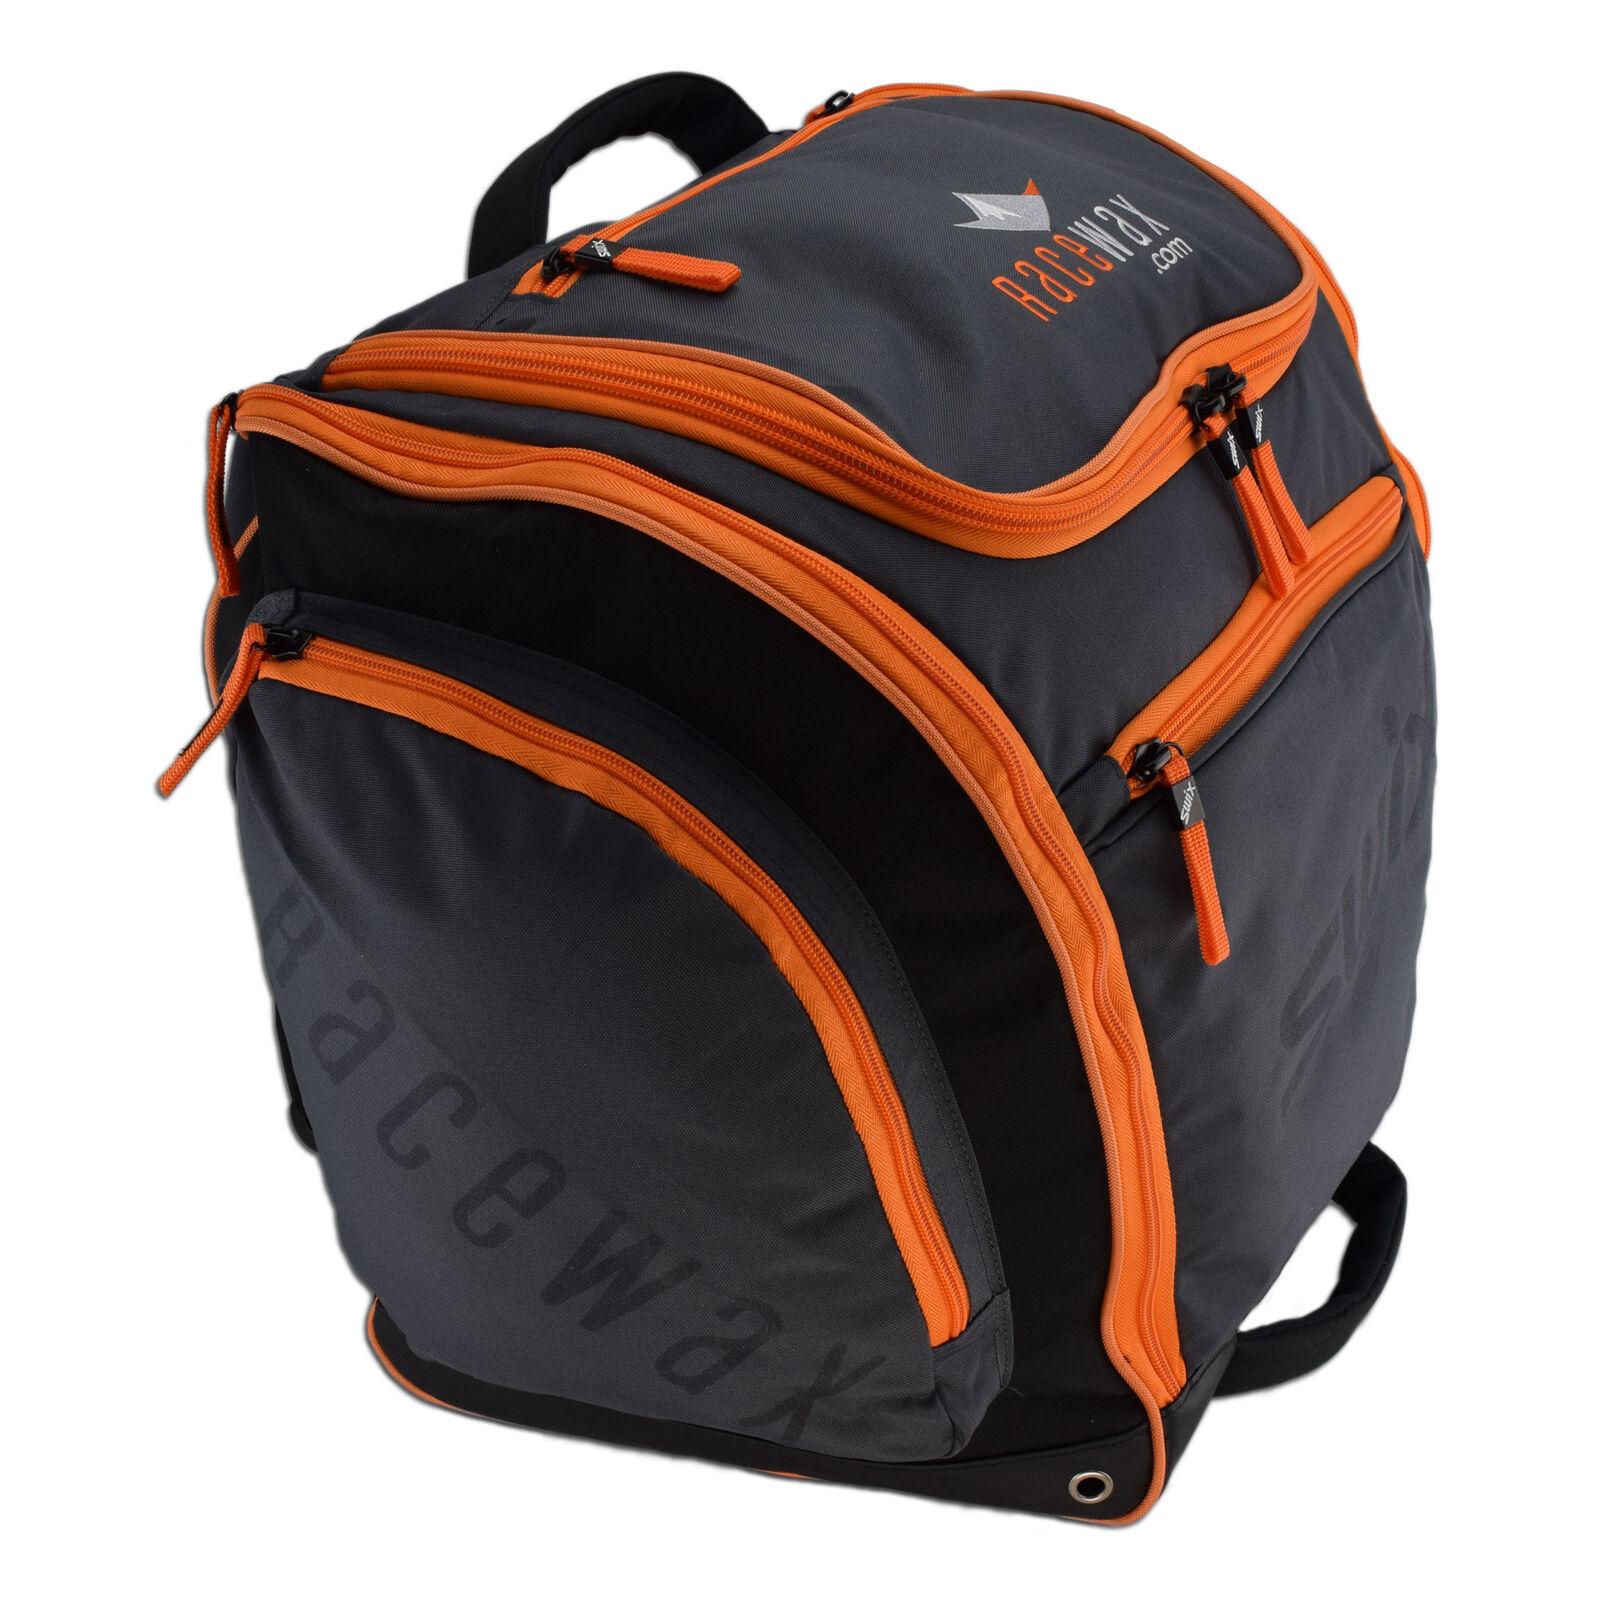 RaceWax 65 Liter Ski Boot Bag